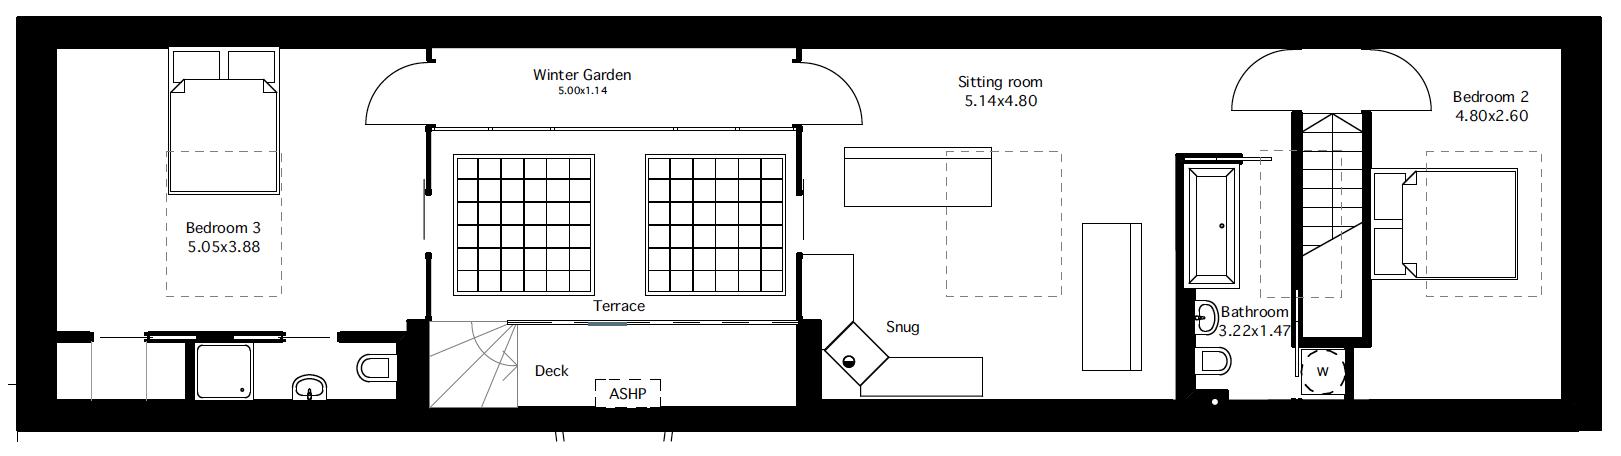 Flat 2 fourth floor plan